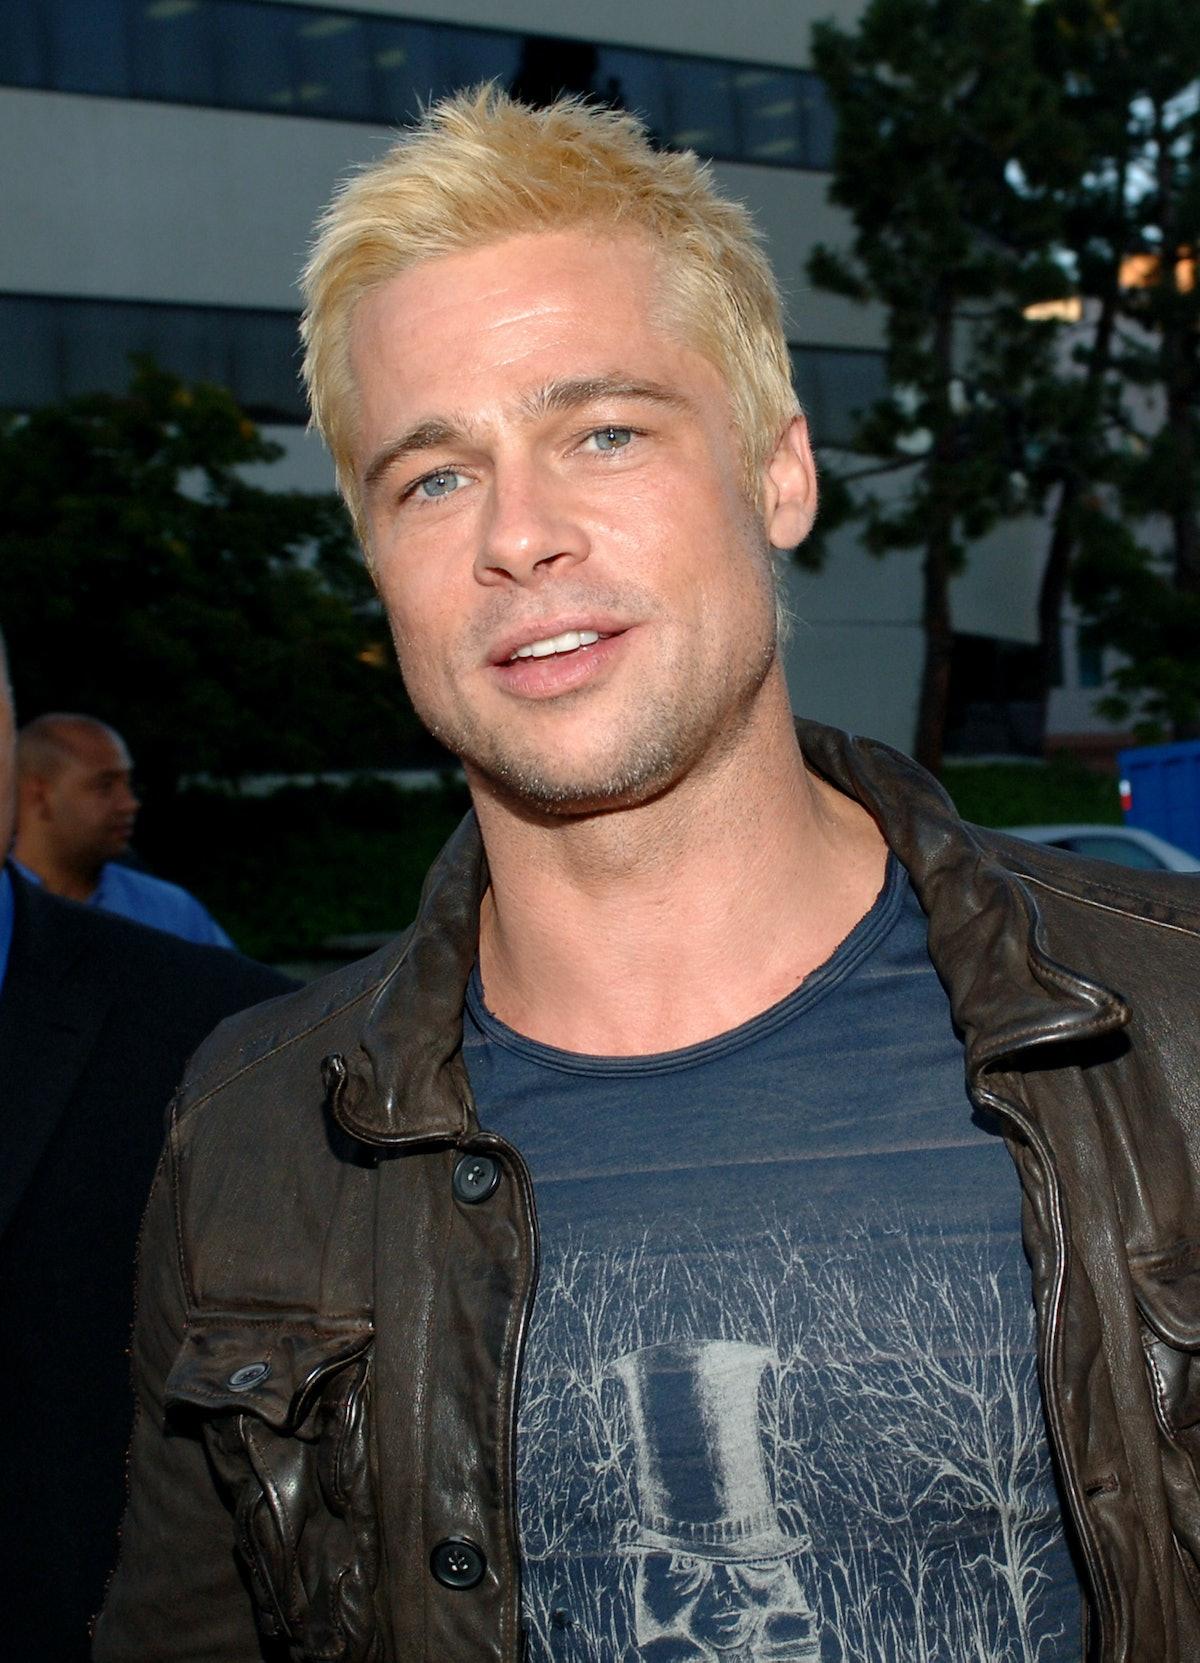 Jennifer Aniston and Brad Pitt's break up in 2005 left a huge impact on pop culture.